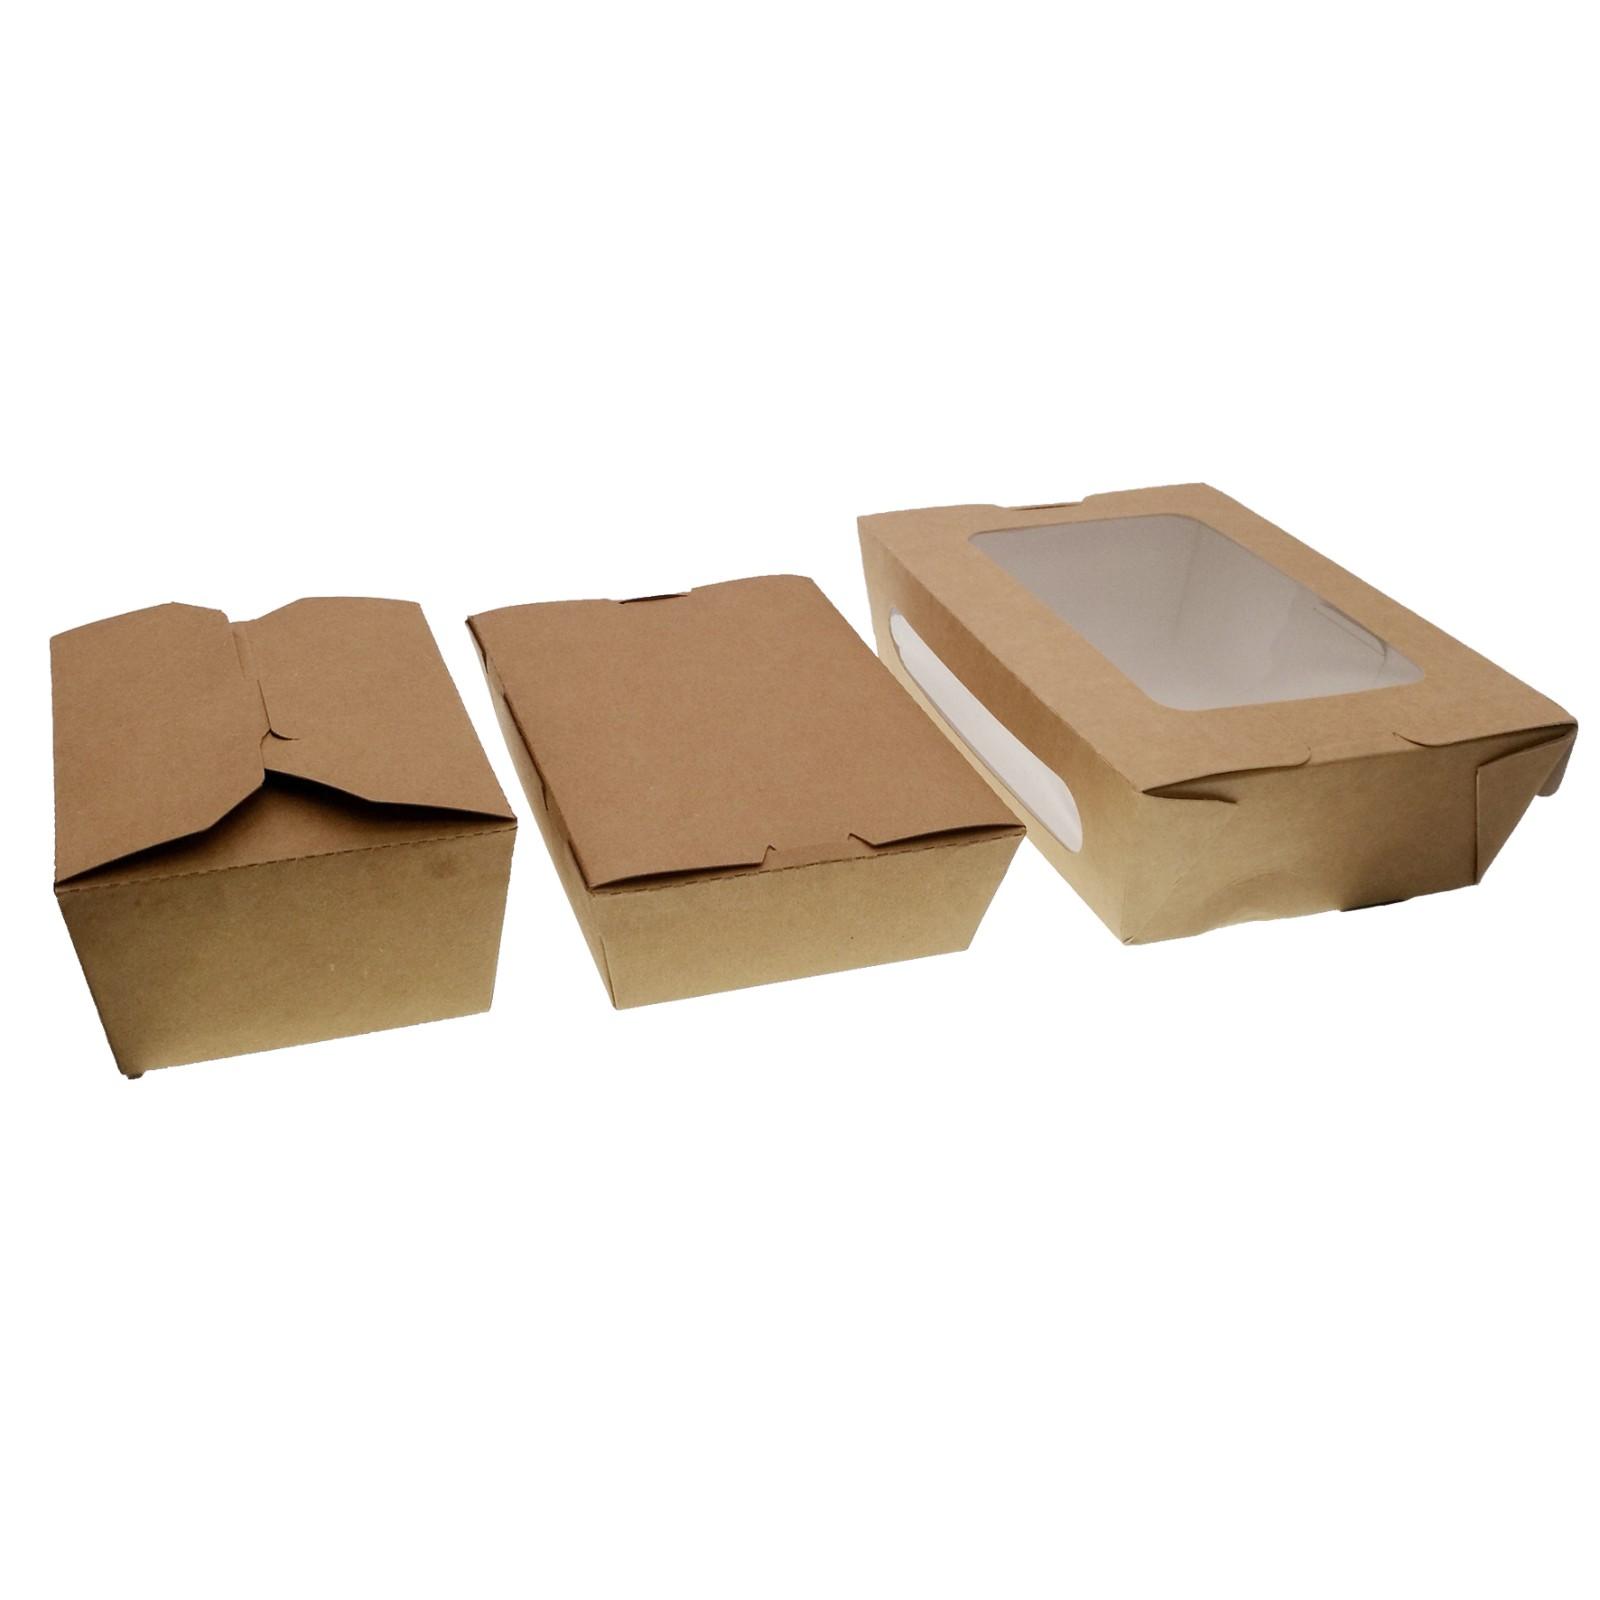 Welm drug custom printed shipping boxes wholesale manufacturer for medicine-2